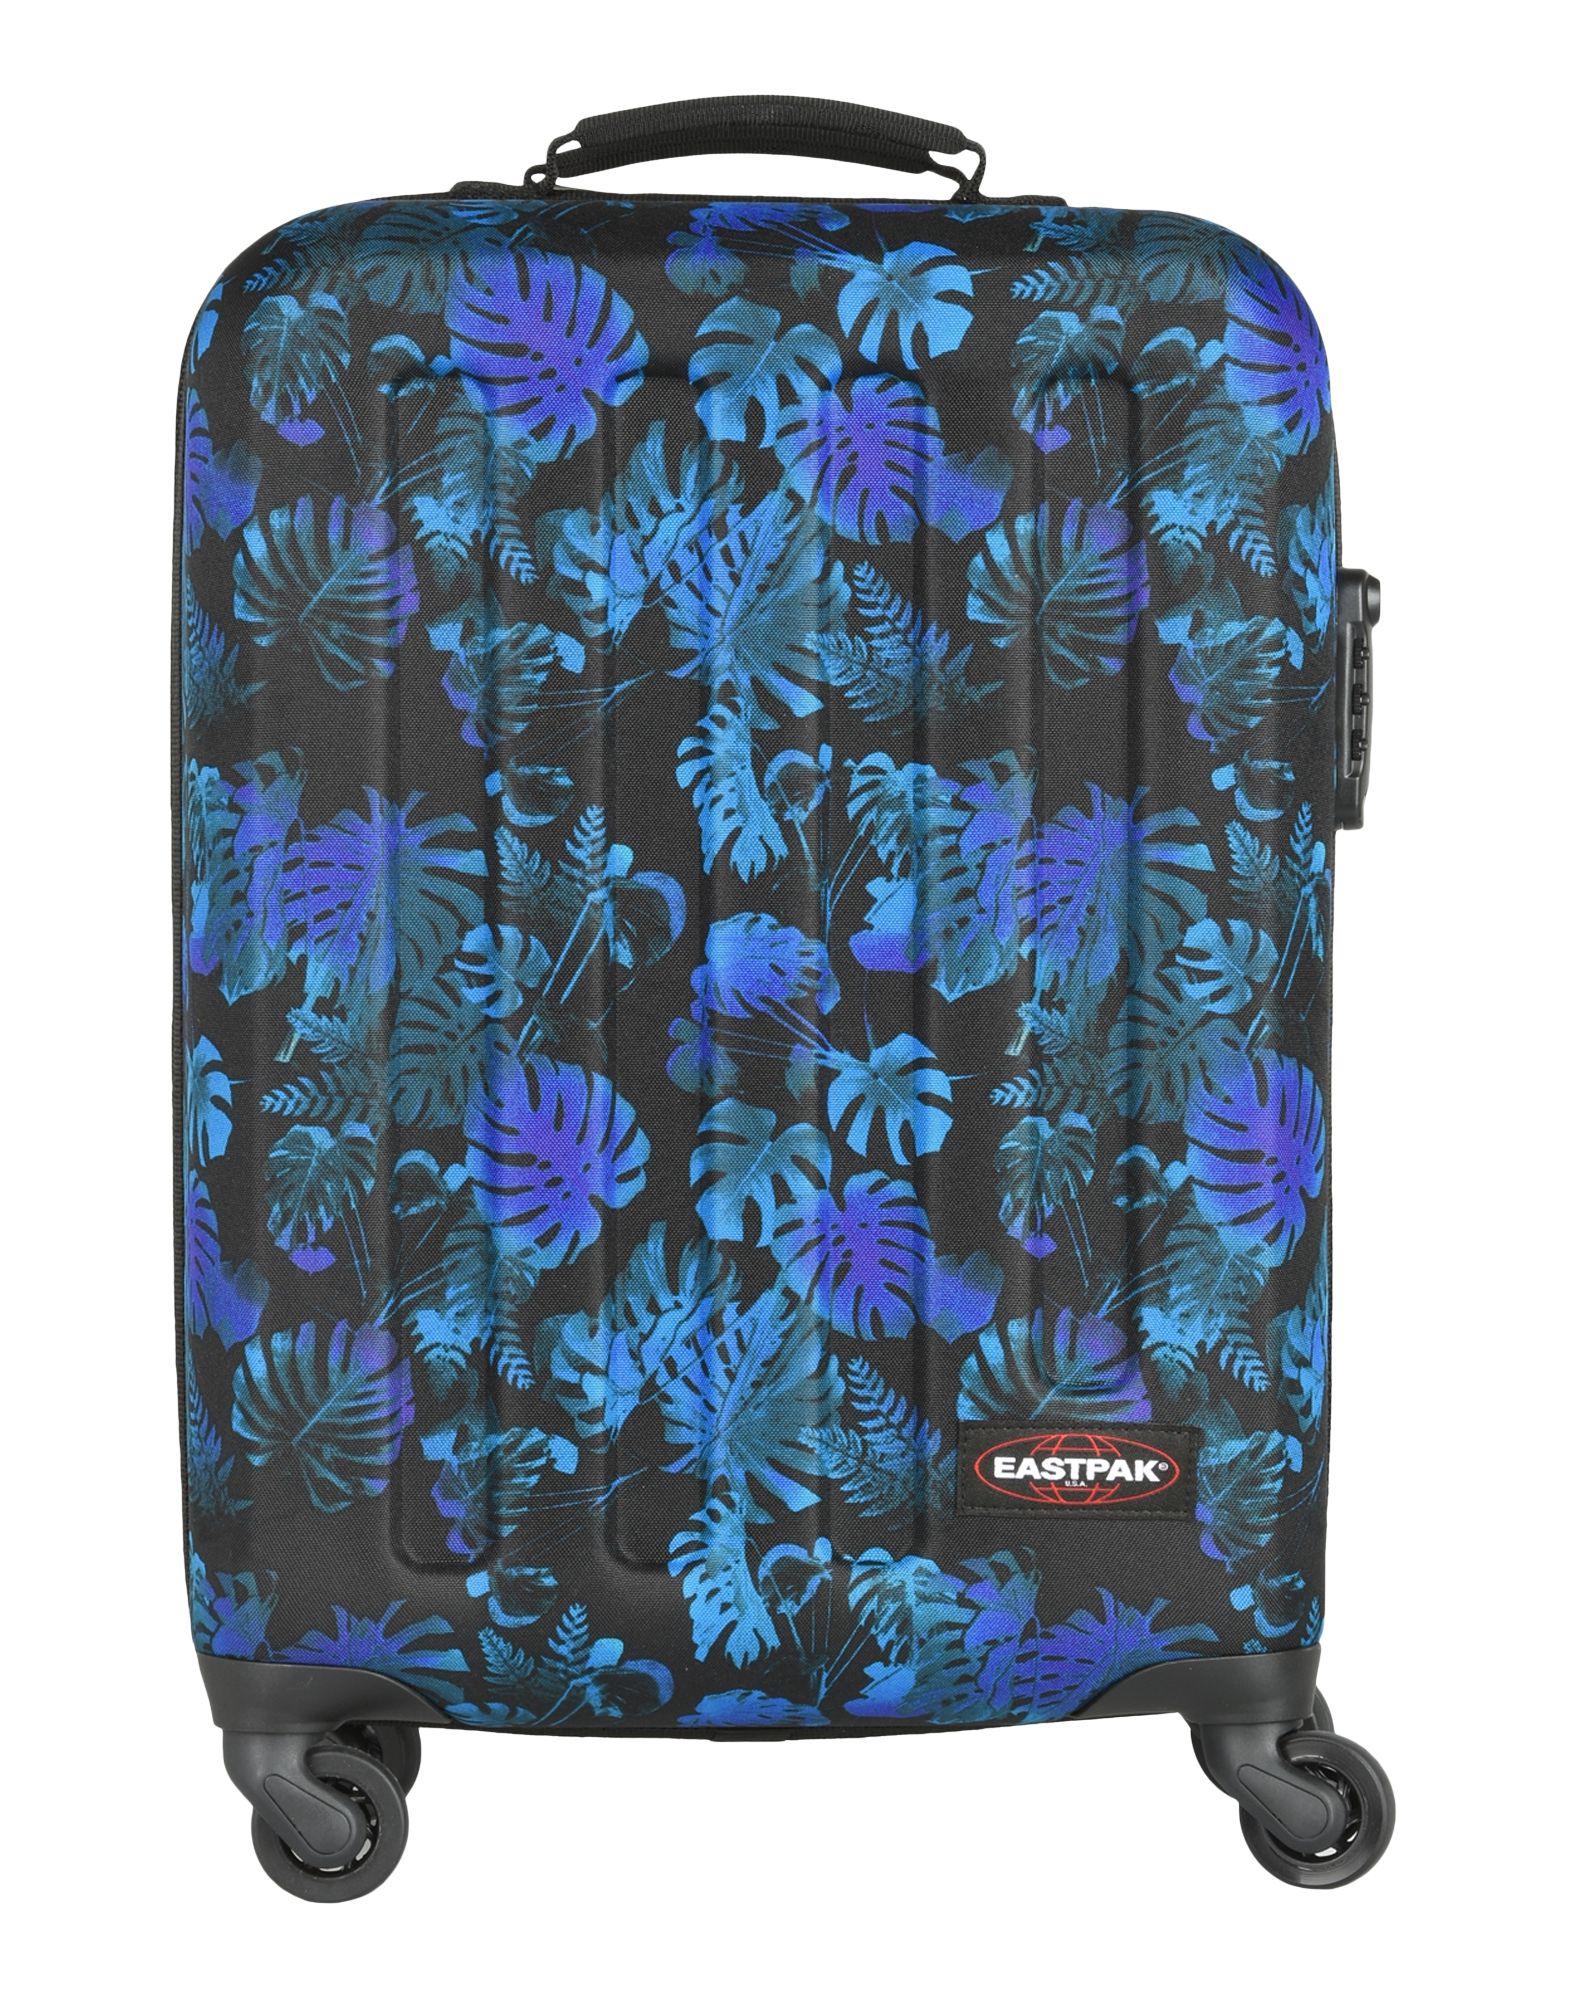 EASTPAK Чемодан/сумка на колесиках чемодан samsonite чемодан 78 см base boost